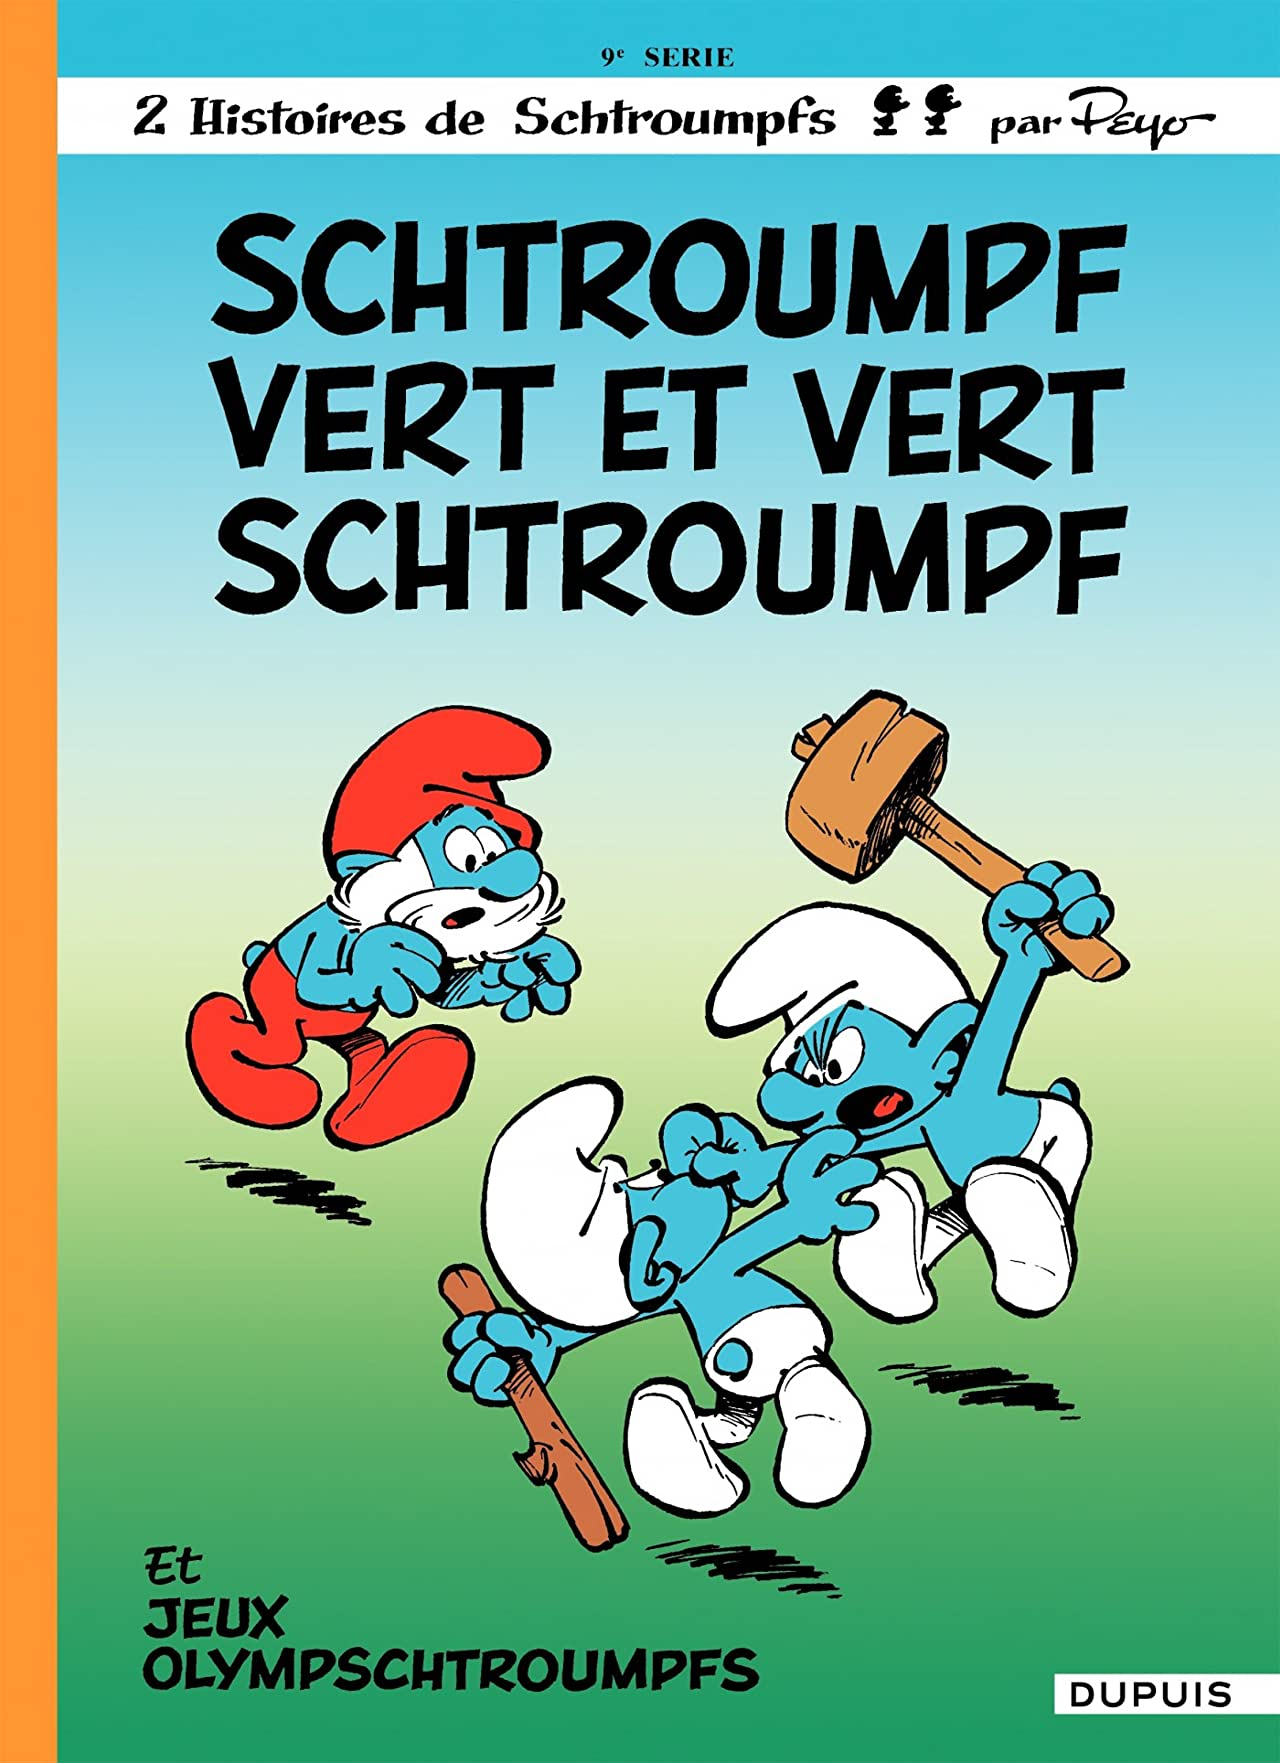 Les Schtroumpfs Vol. 9: Schtroumpf Vert et Vert Schtroumpf